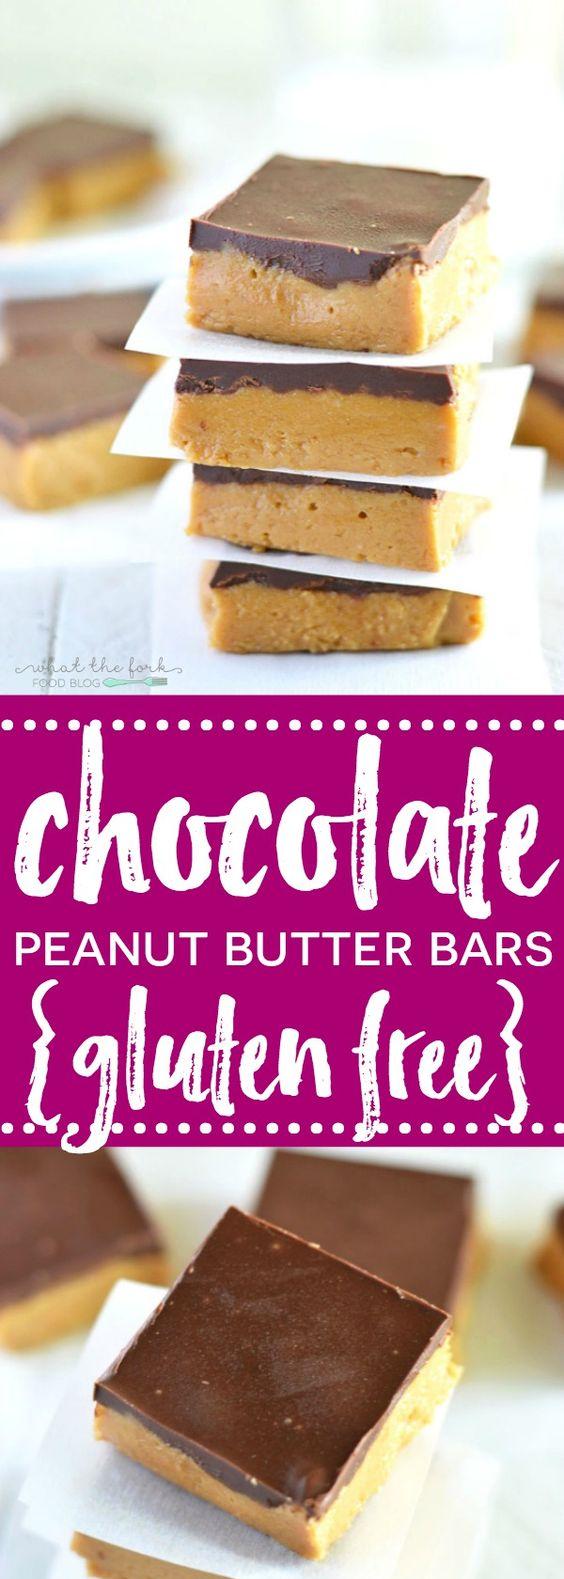 Gluten Free Chocolate Peanut Butter Bars